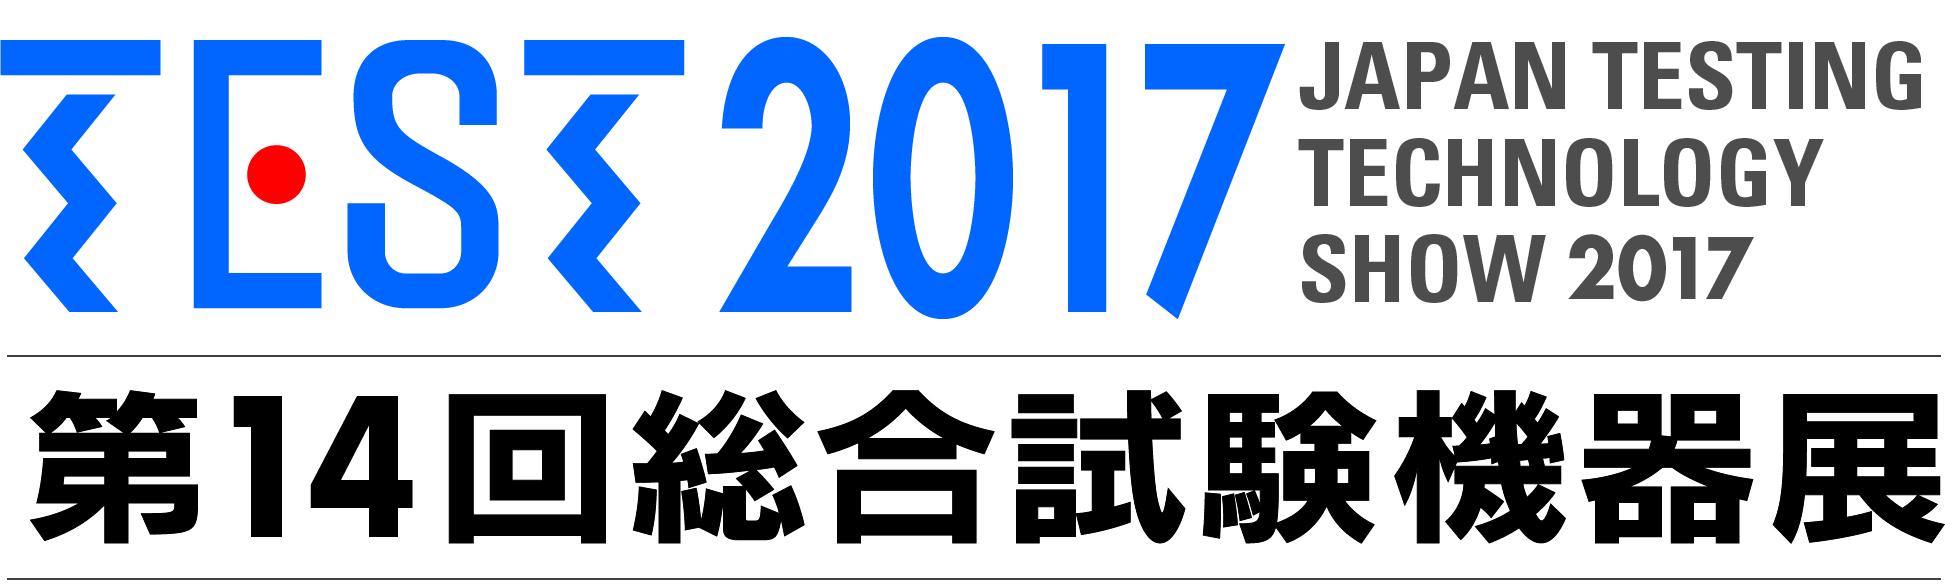 TEST2017